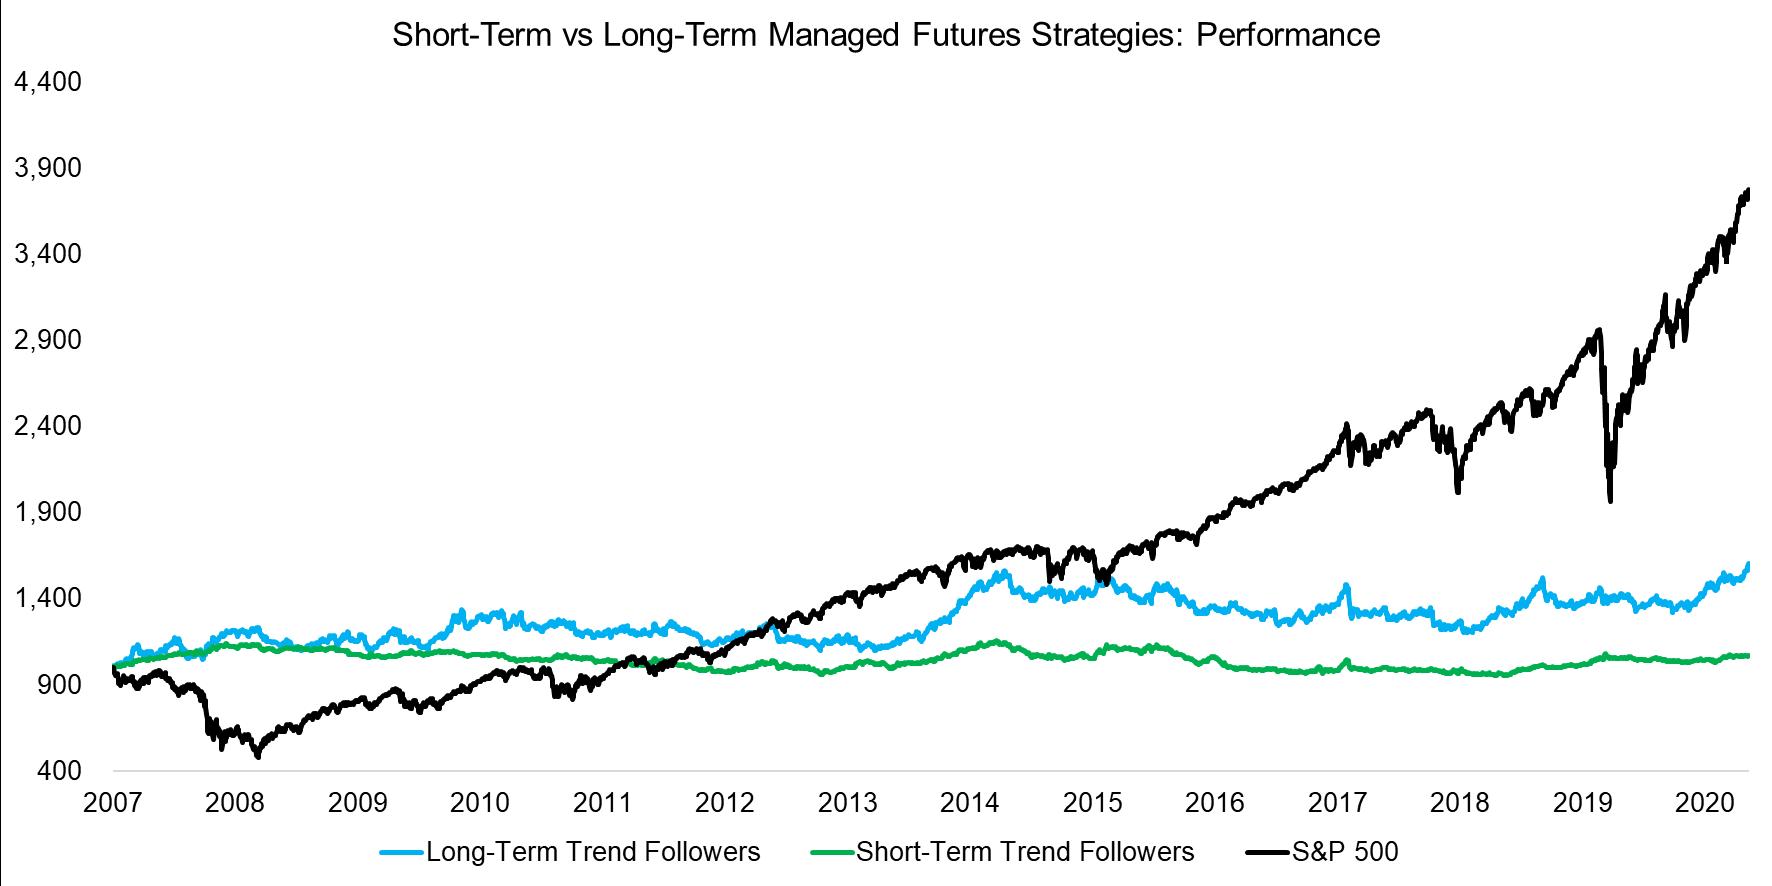 Short-Term vs Long-Term Managed Futures Strategies Performance